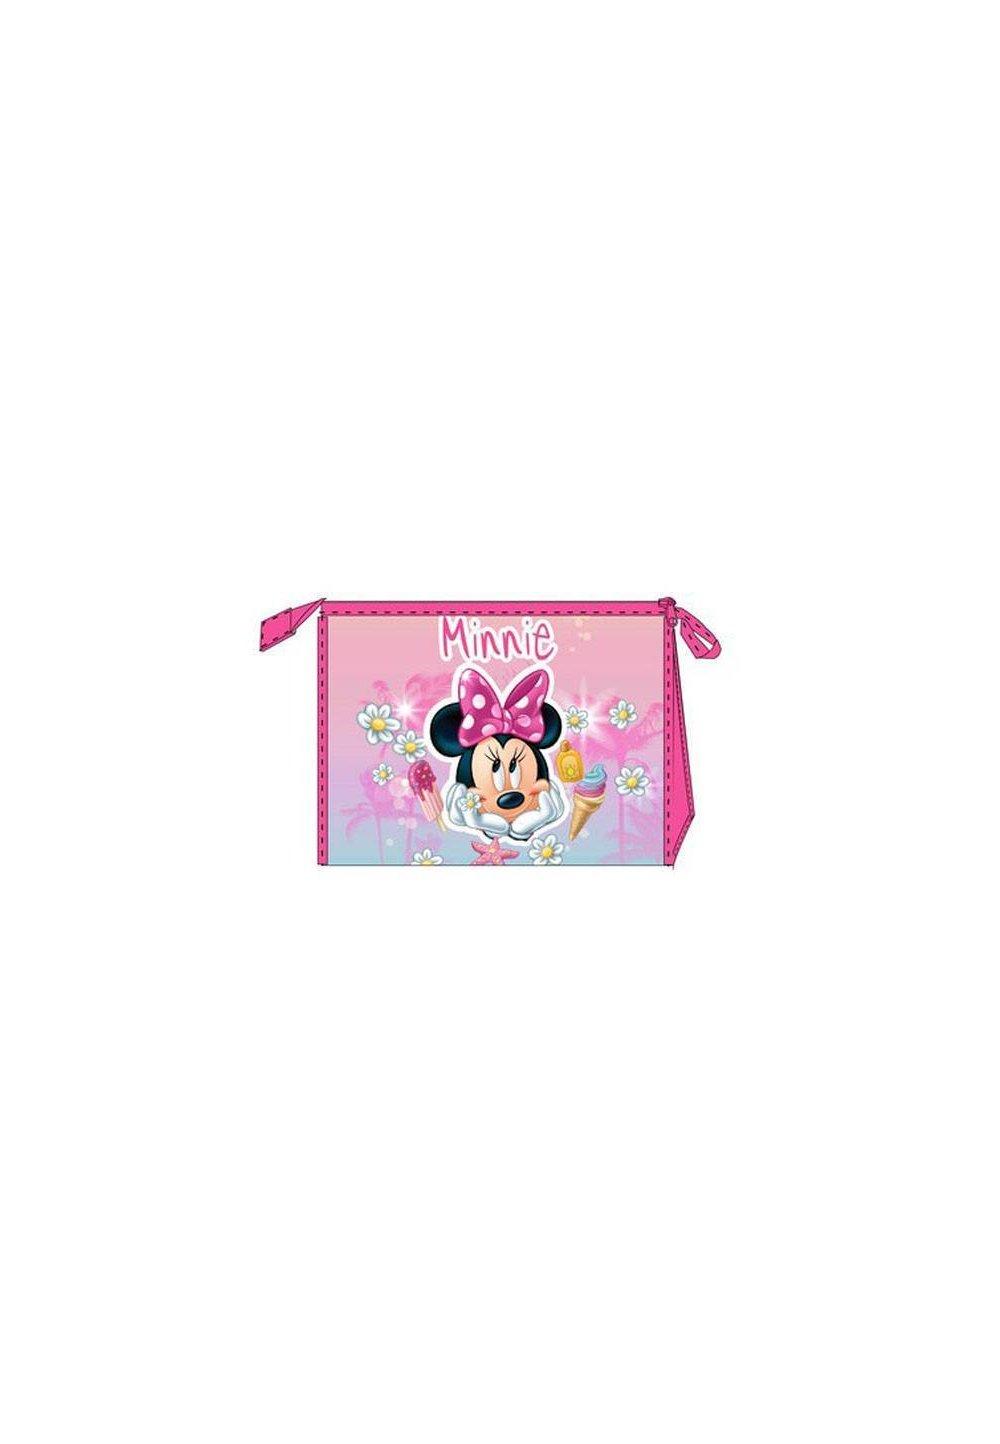 Gentuta portfard, Minnie Mouse, roz imagine